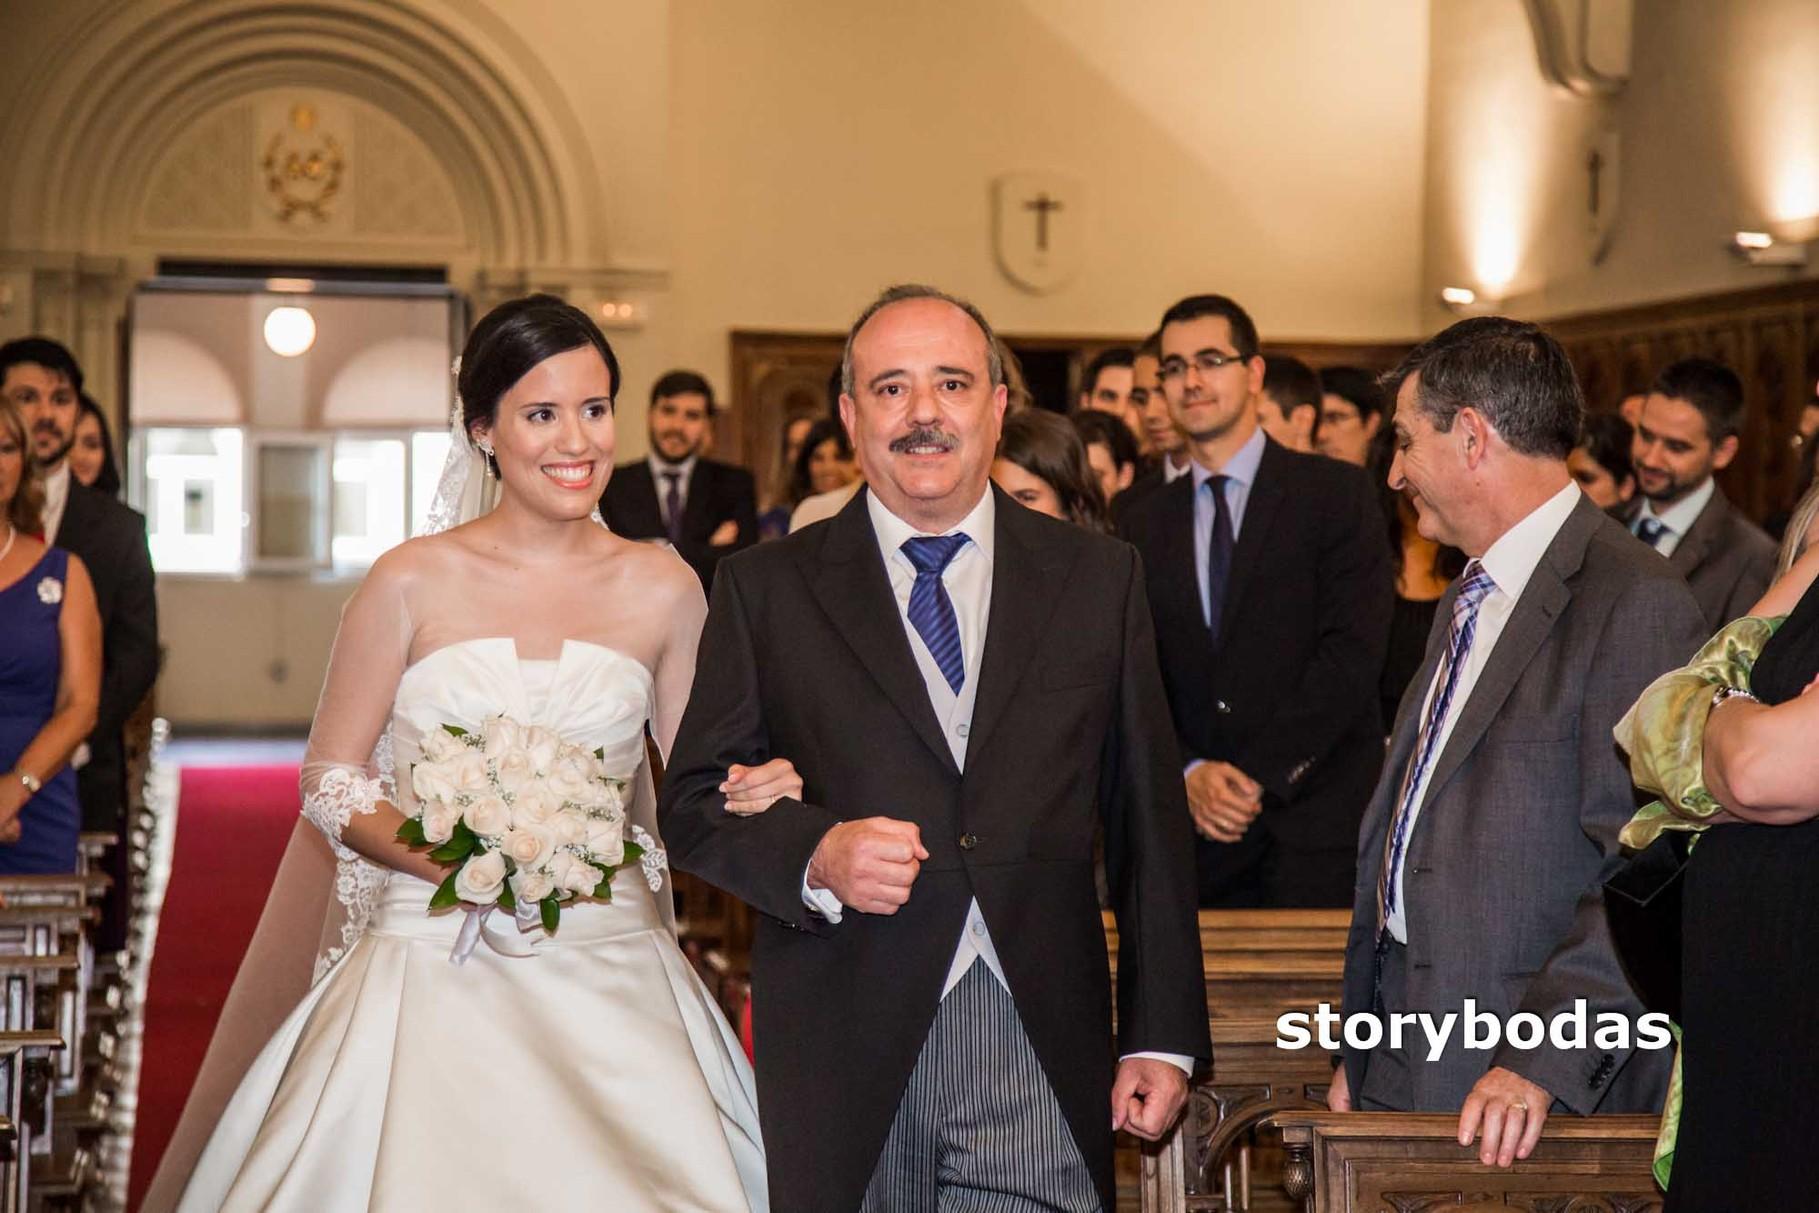 storybodas Llega la novia a la Ceremonia 2